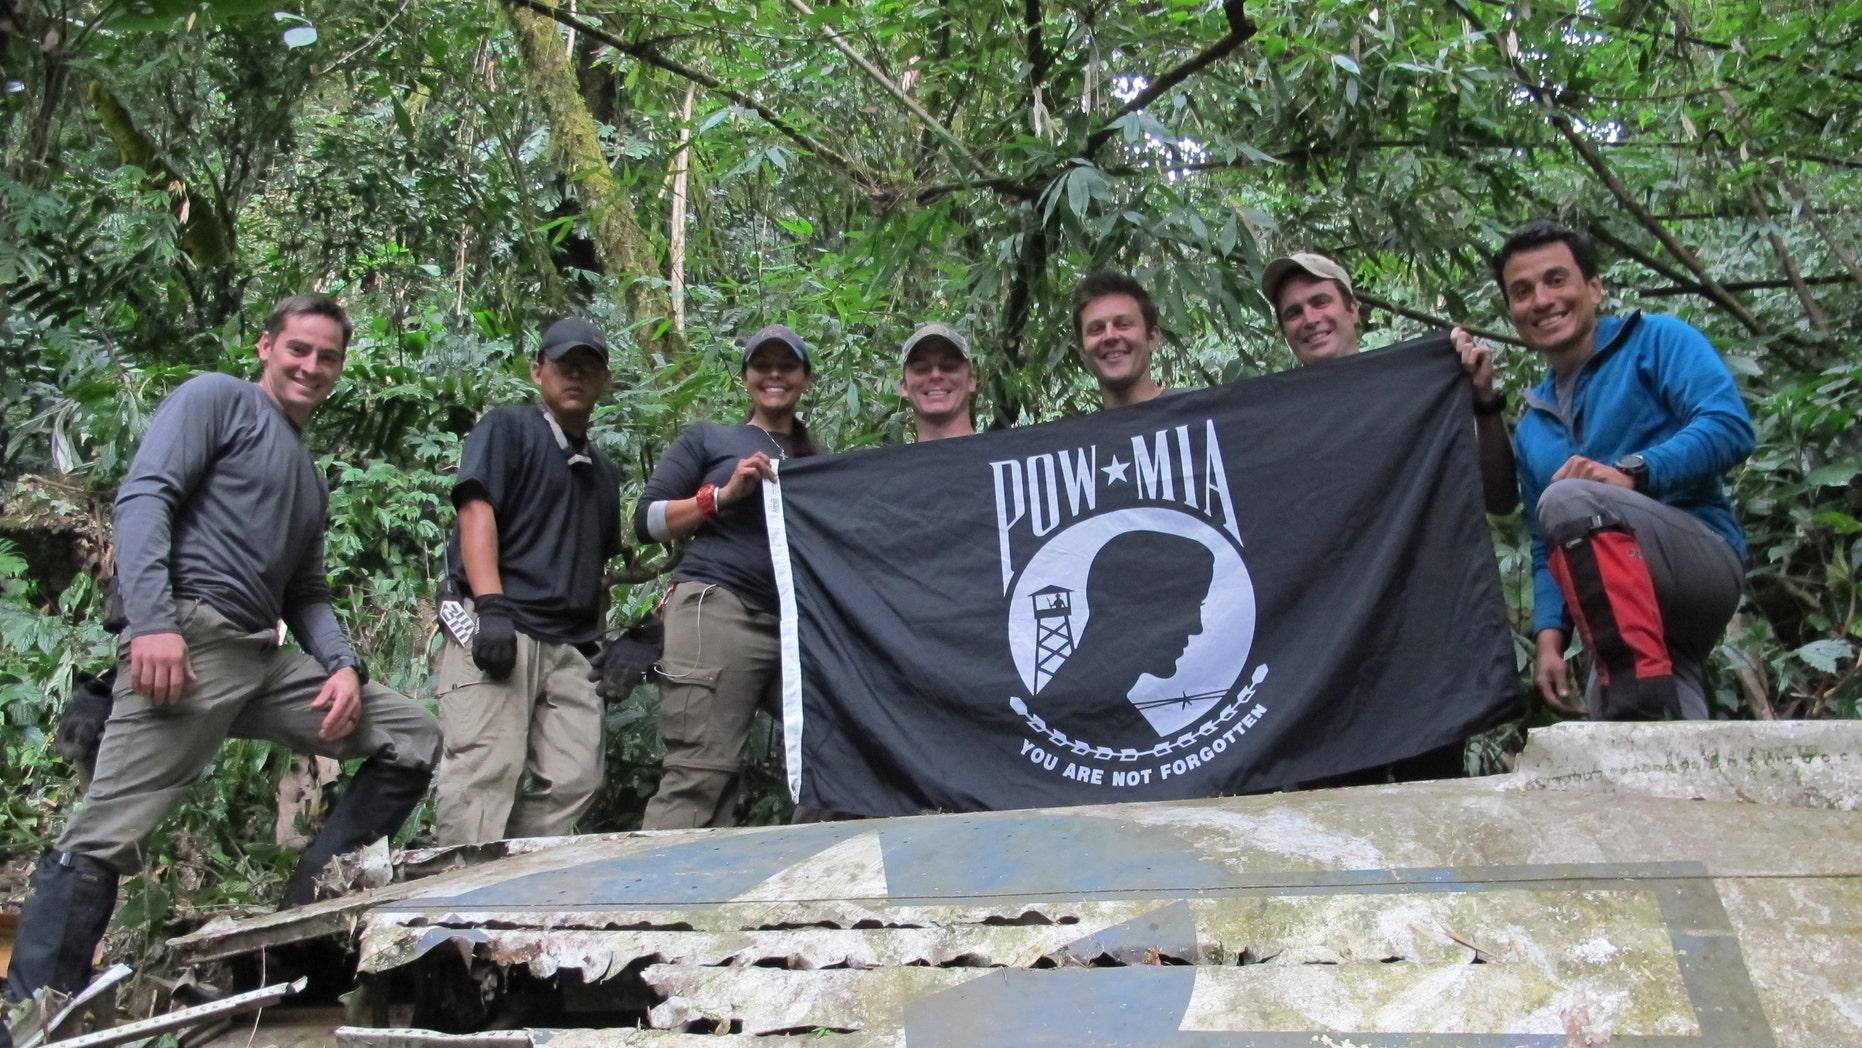 Members from Defense POW/MIA Accounting Agency (DPAA), hold the POW/MIA flag above a piece of metallic debris during a DPAA investigation mission near Bhismaknagar Village, Arunachal Pradesh, India, Dec. 02, 2016. (DoD photo by U.S. Marine Staff Sgt. Christopher Cantu)